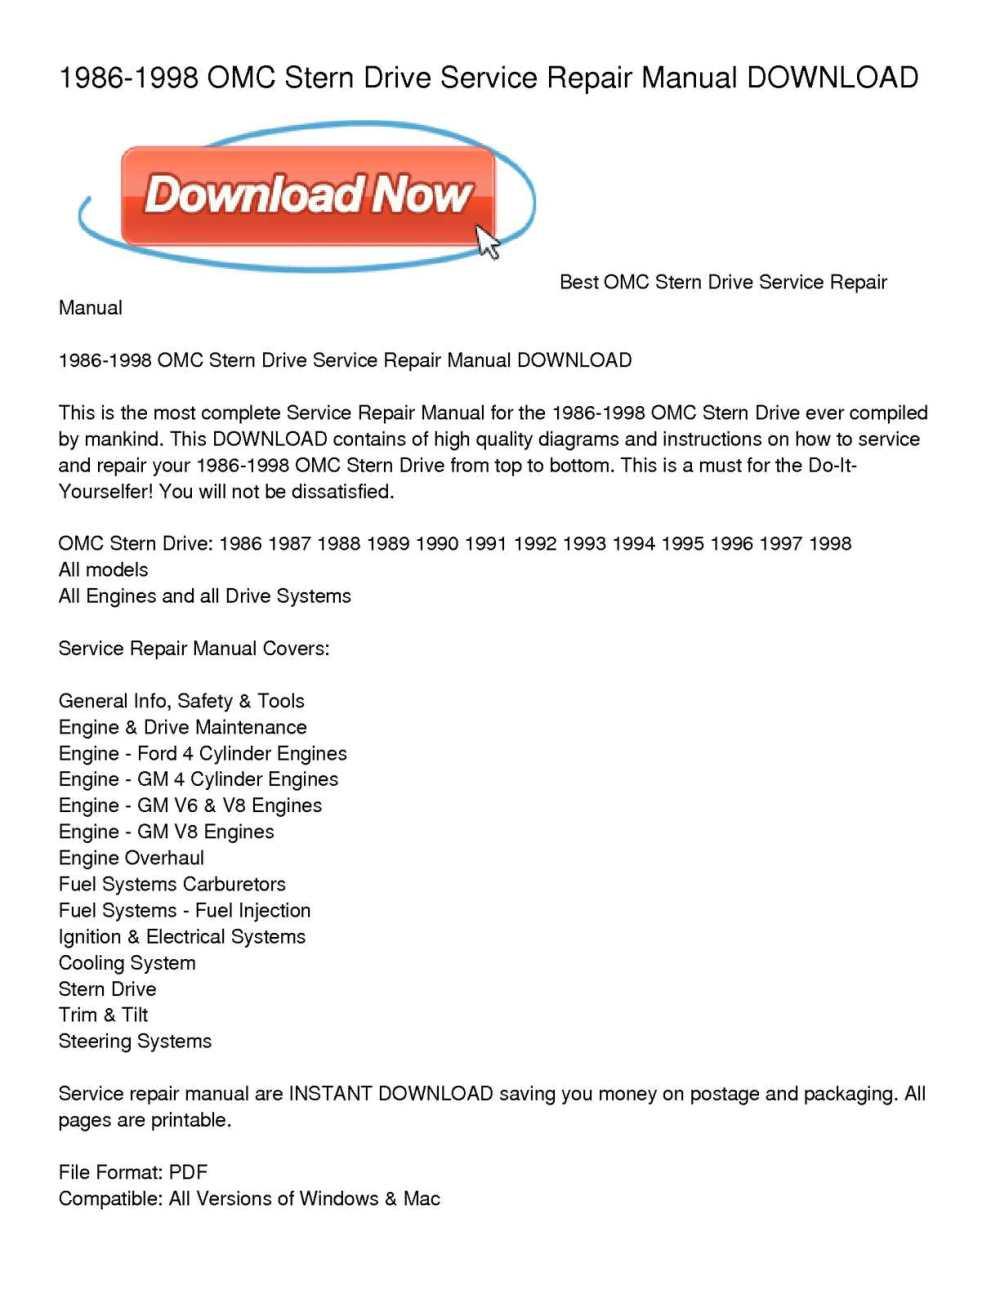 medium resolution of 1986 1998 omc stern drive service repair manual download